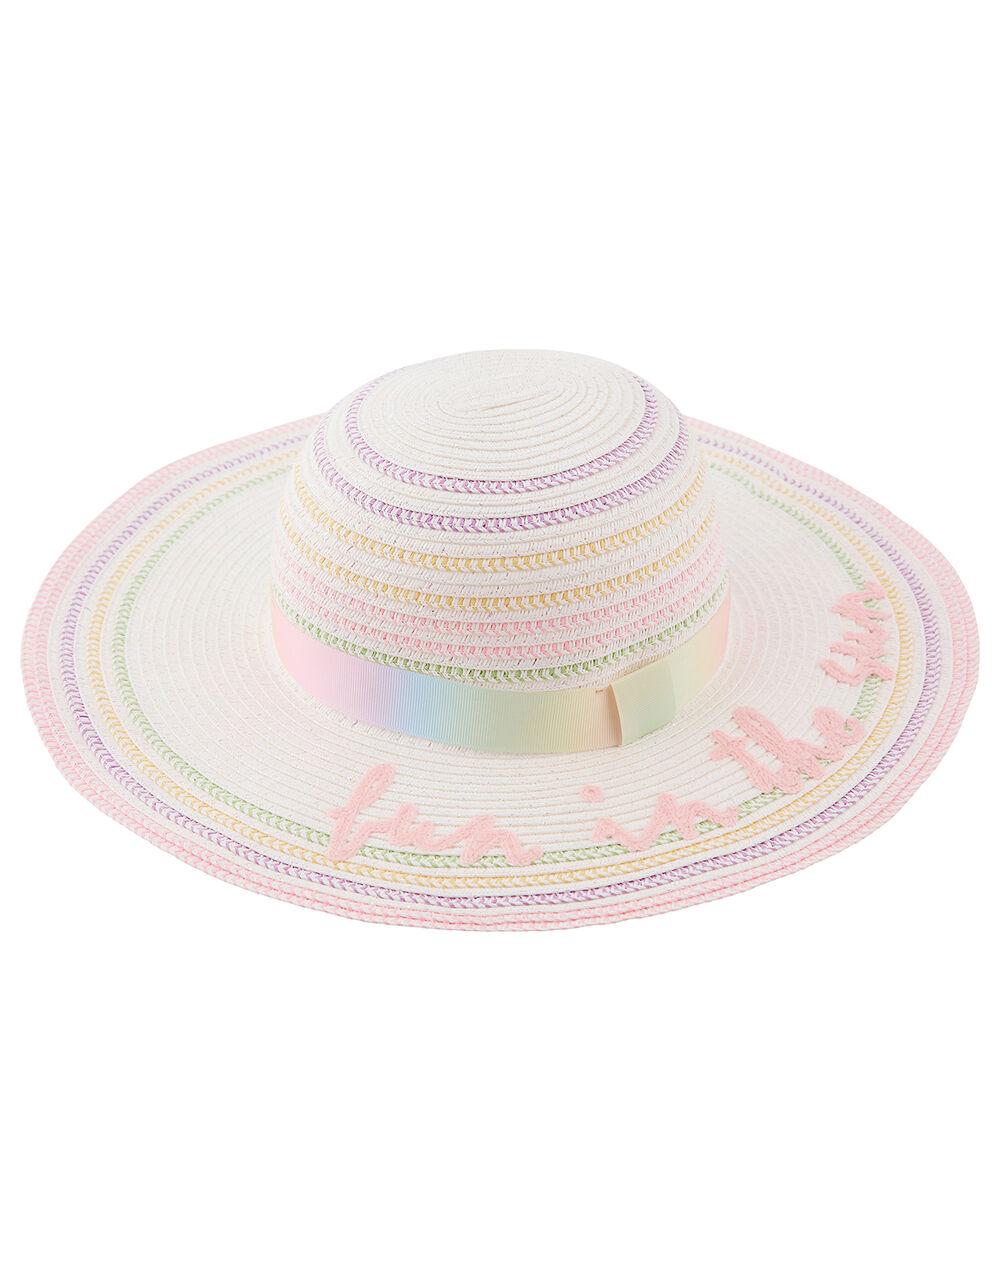 Fun in the Sun Rainbow Floppy Hat, Multi (MULTI), large